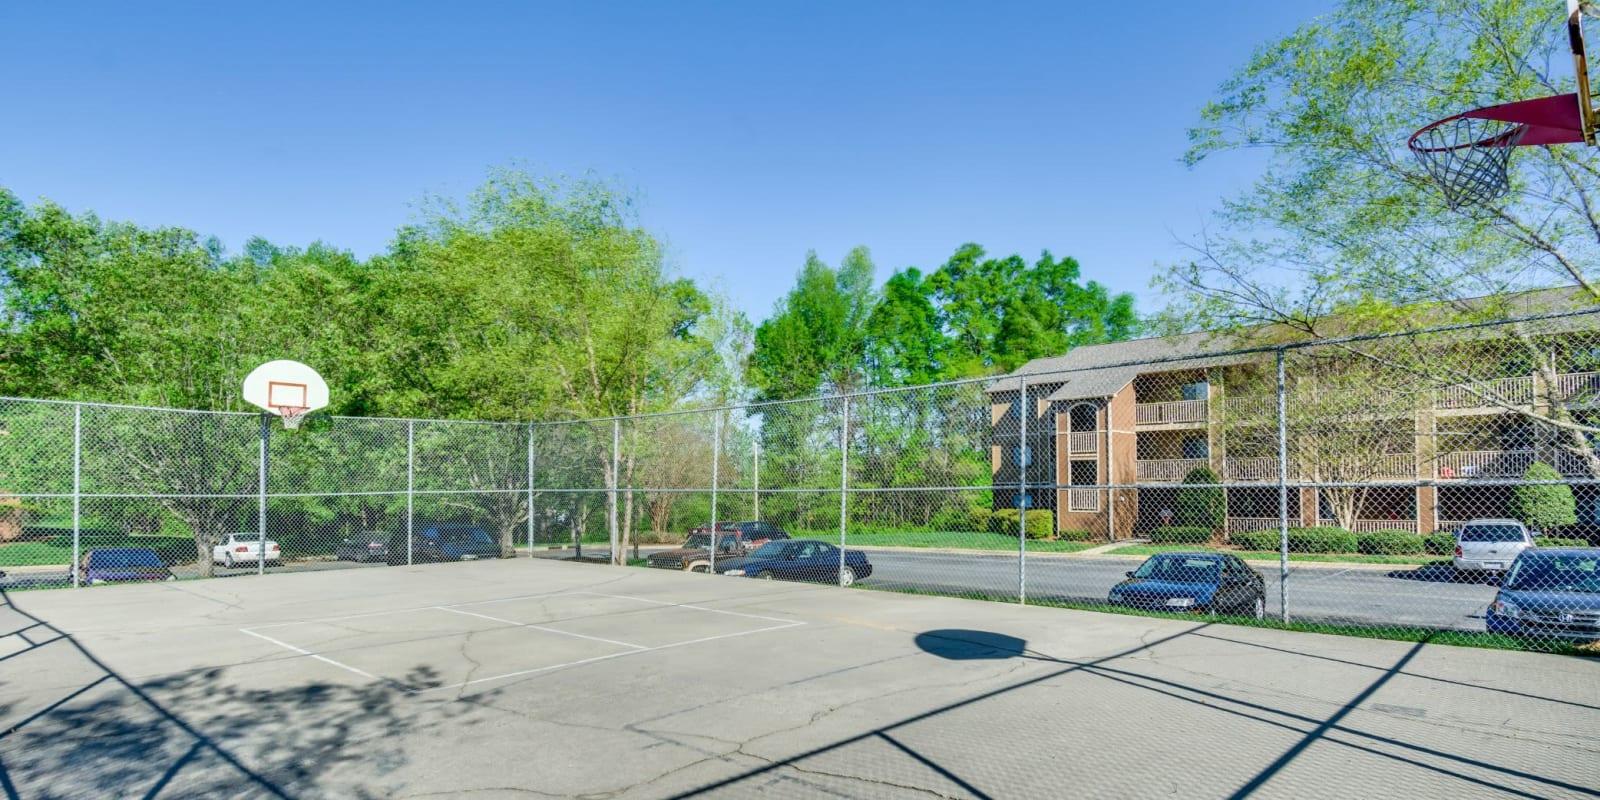 Onsite basketball court at Woodbrook Apartment Homes in Monroe, North Carolina